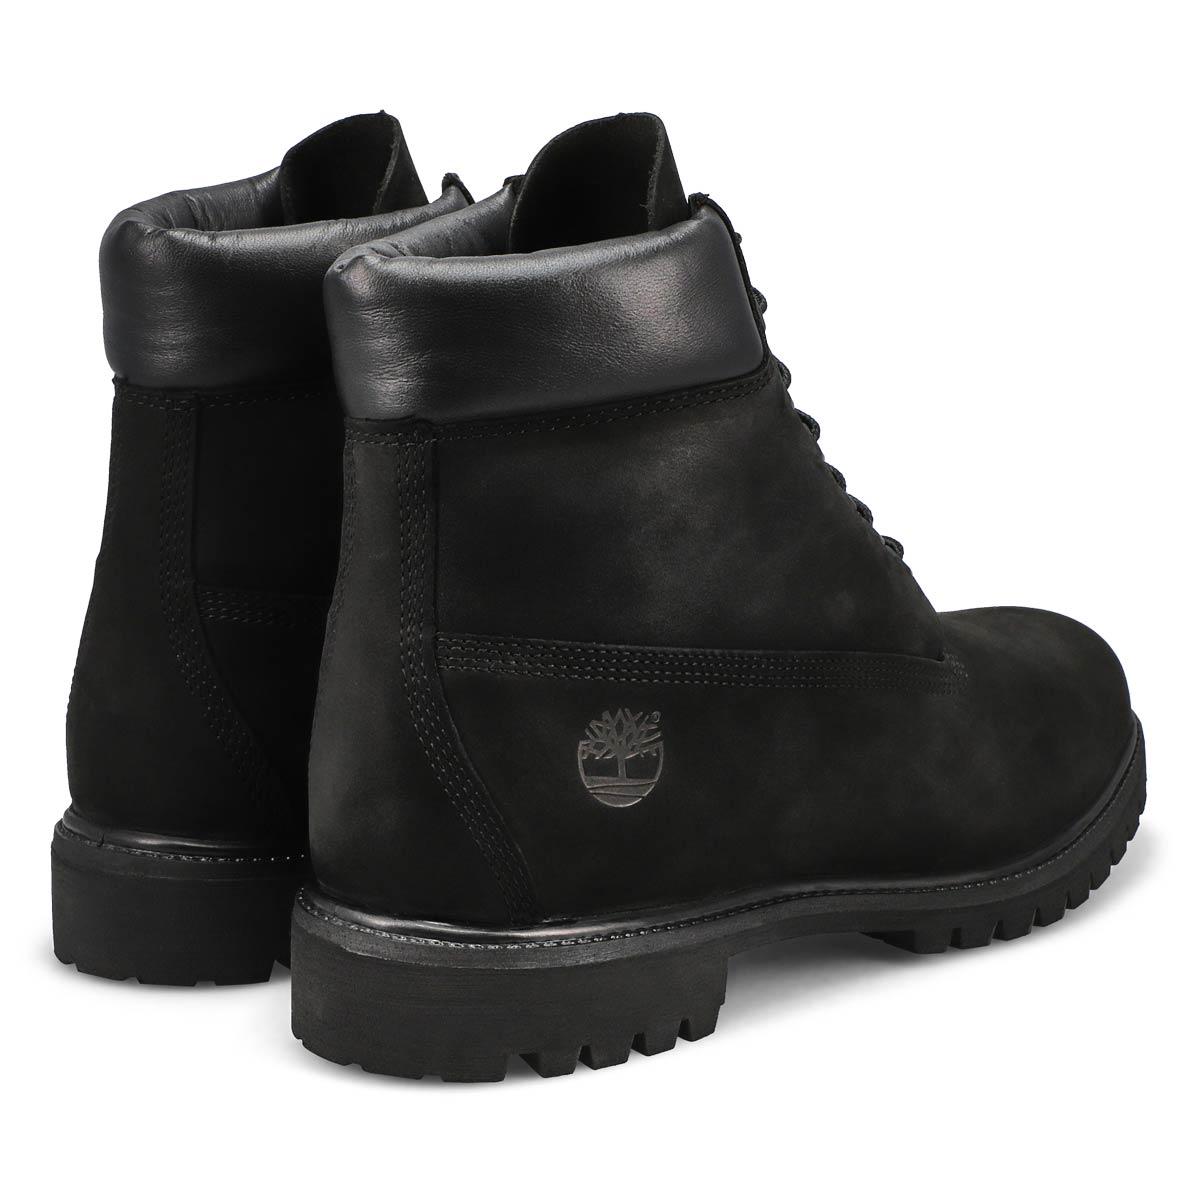 Men's Icon 6 Premium Waterproof Ankle Boot - Blk